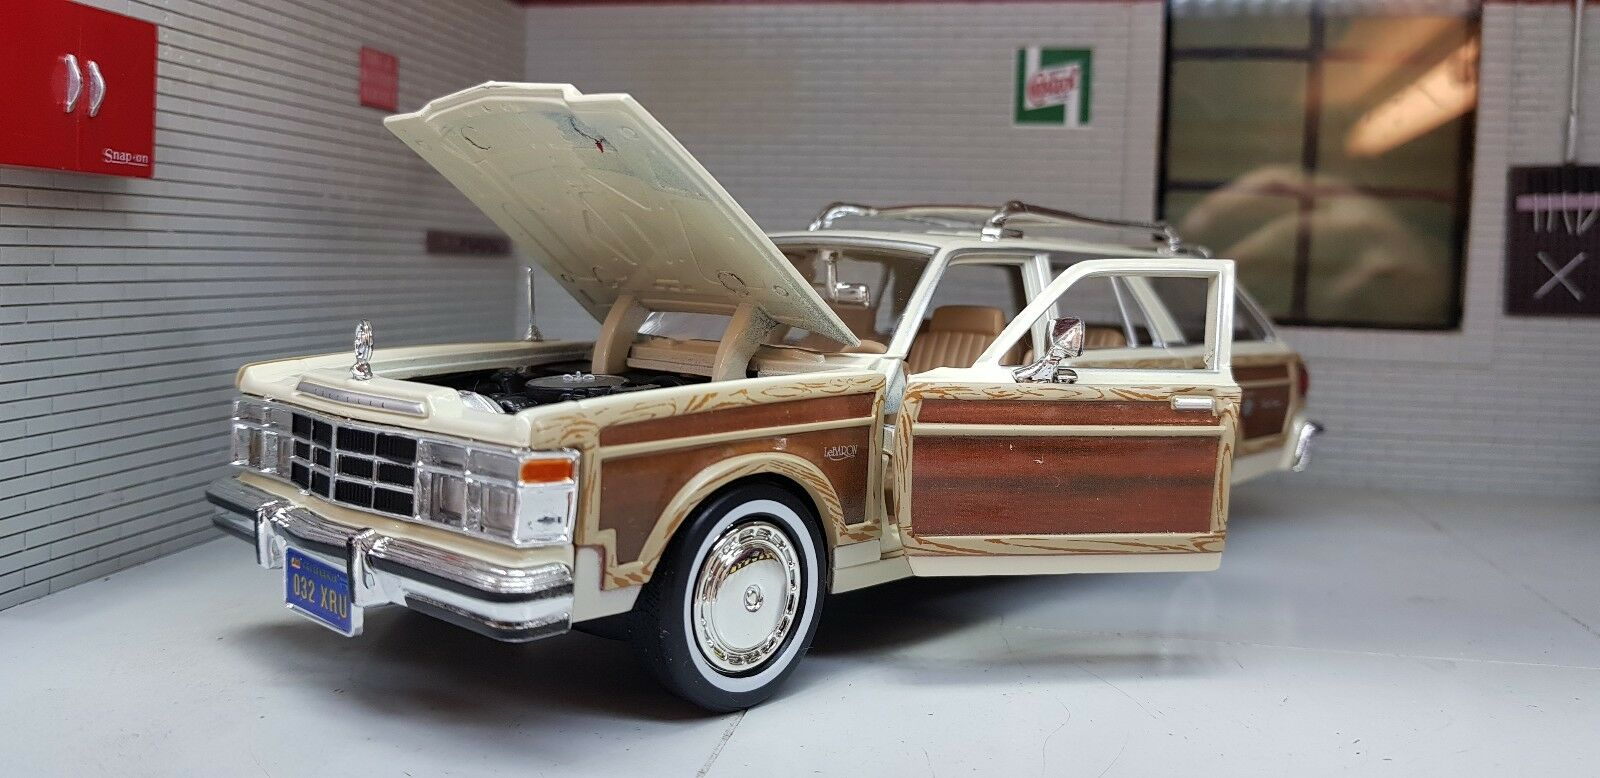 G LGB 1 24 Echelle 1979 Crème Chrysler le Baron Town & Country Motormax